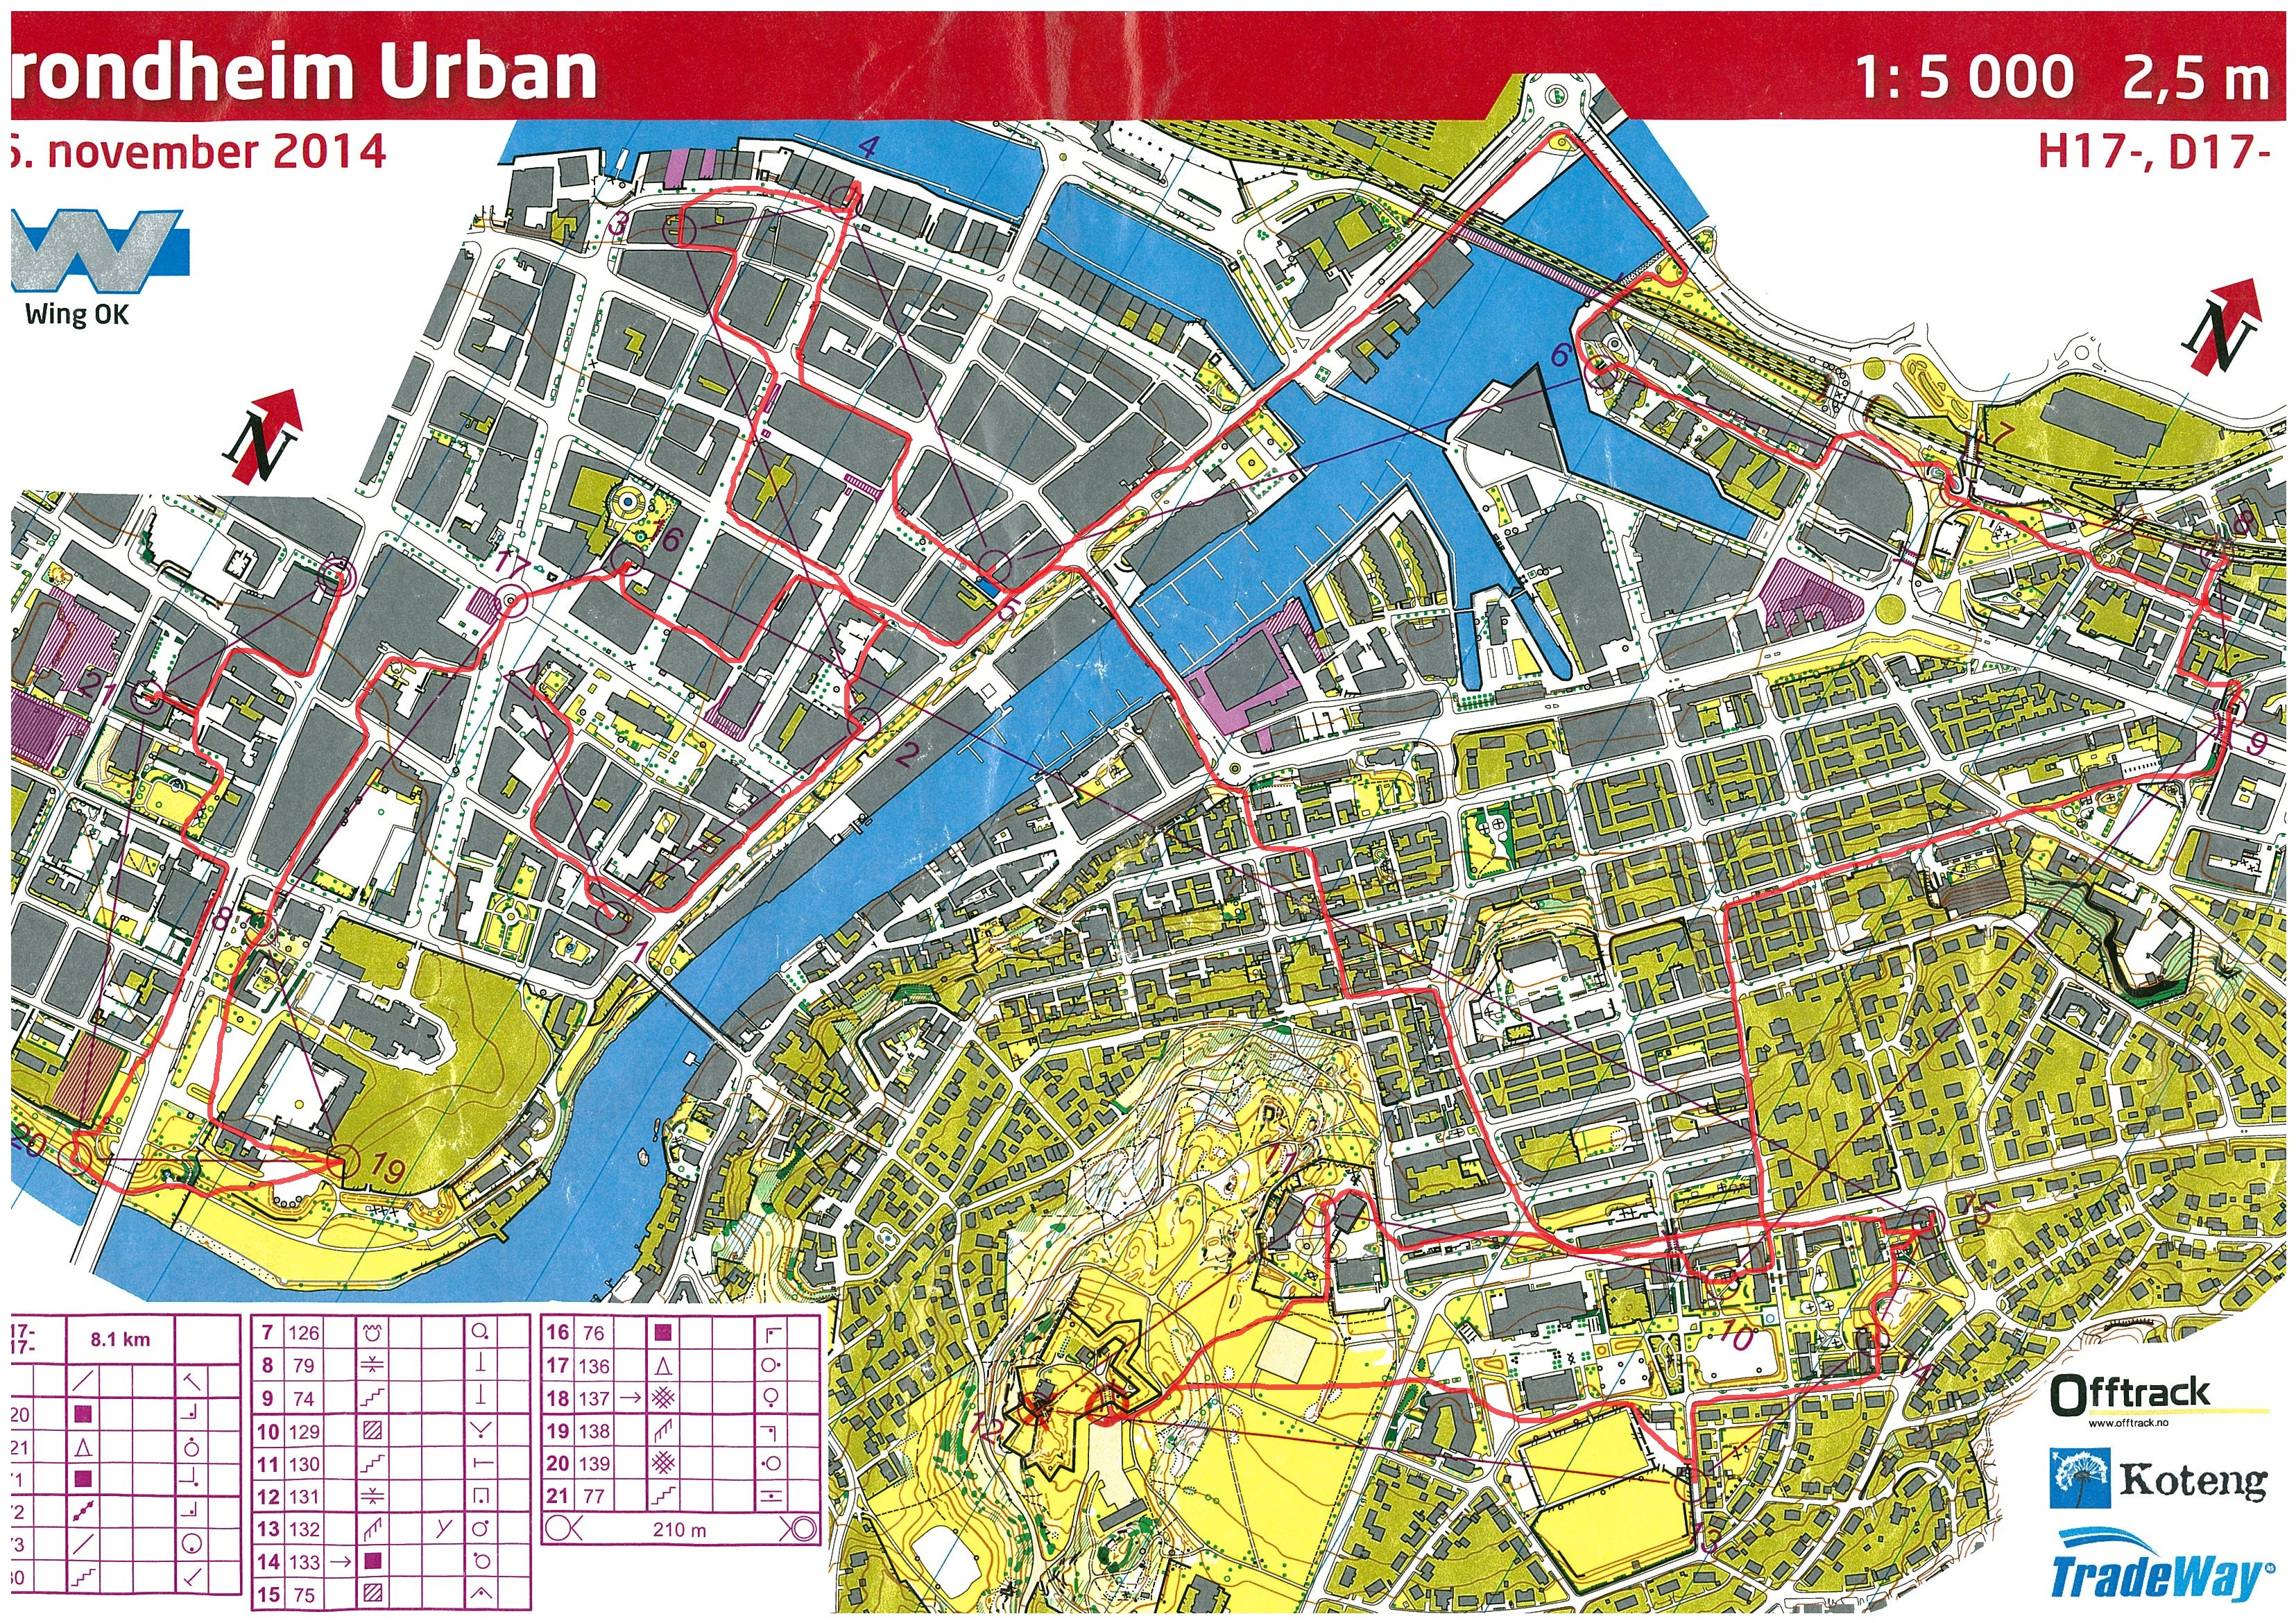 kart over trondheim sentrum Kristines kartarkiv :: Trondheim Urban (16.11.2014) kart over trondheim sentrum